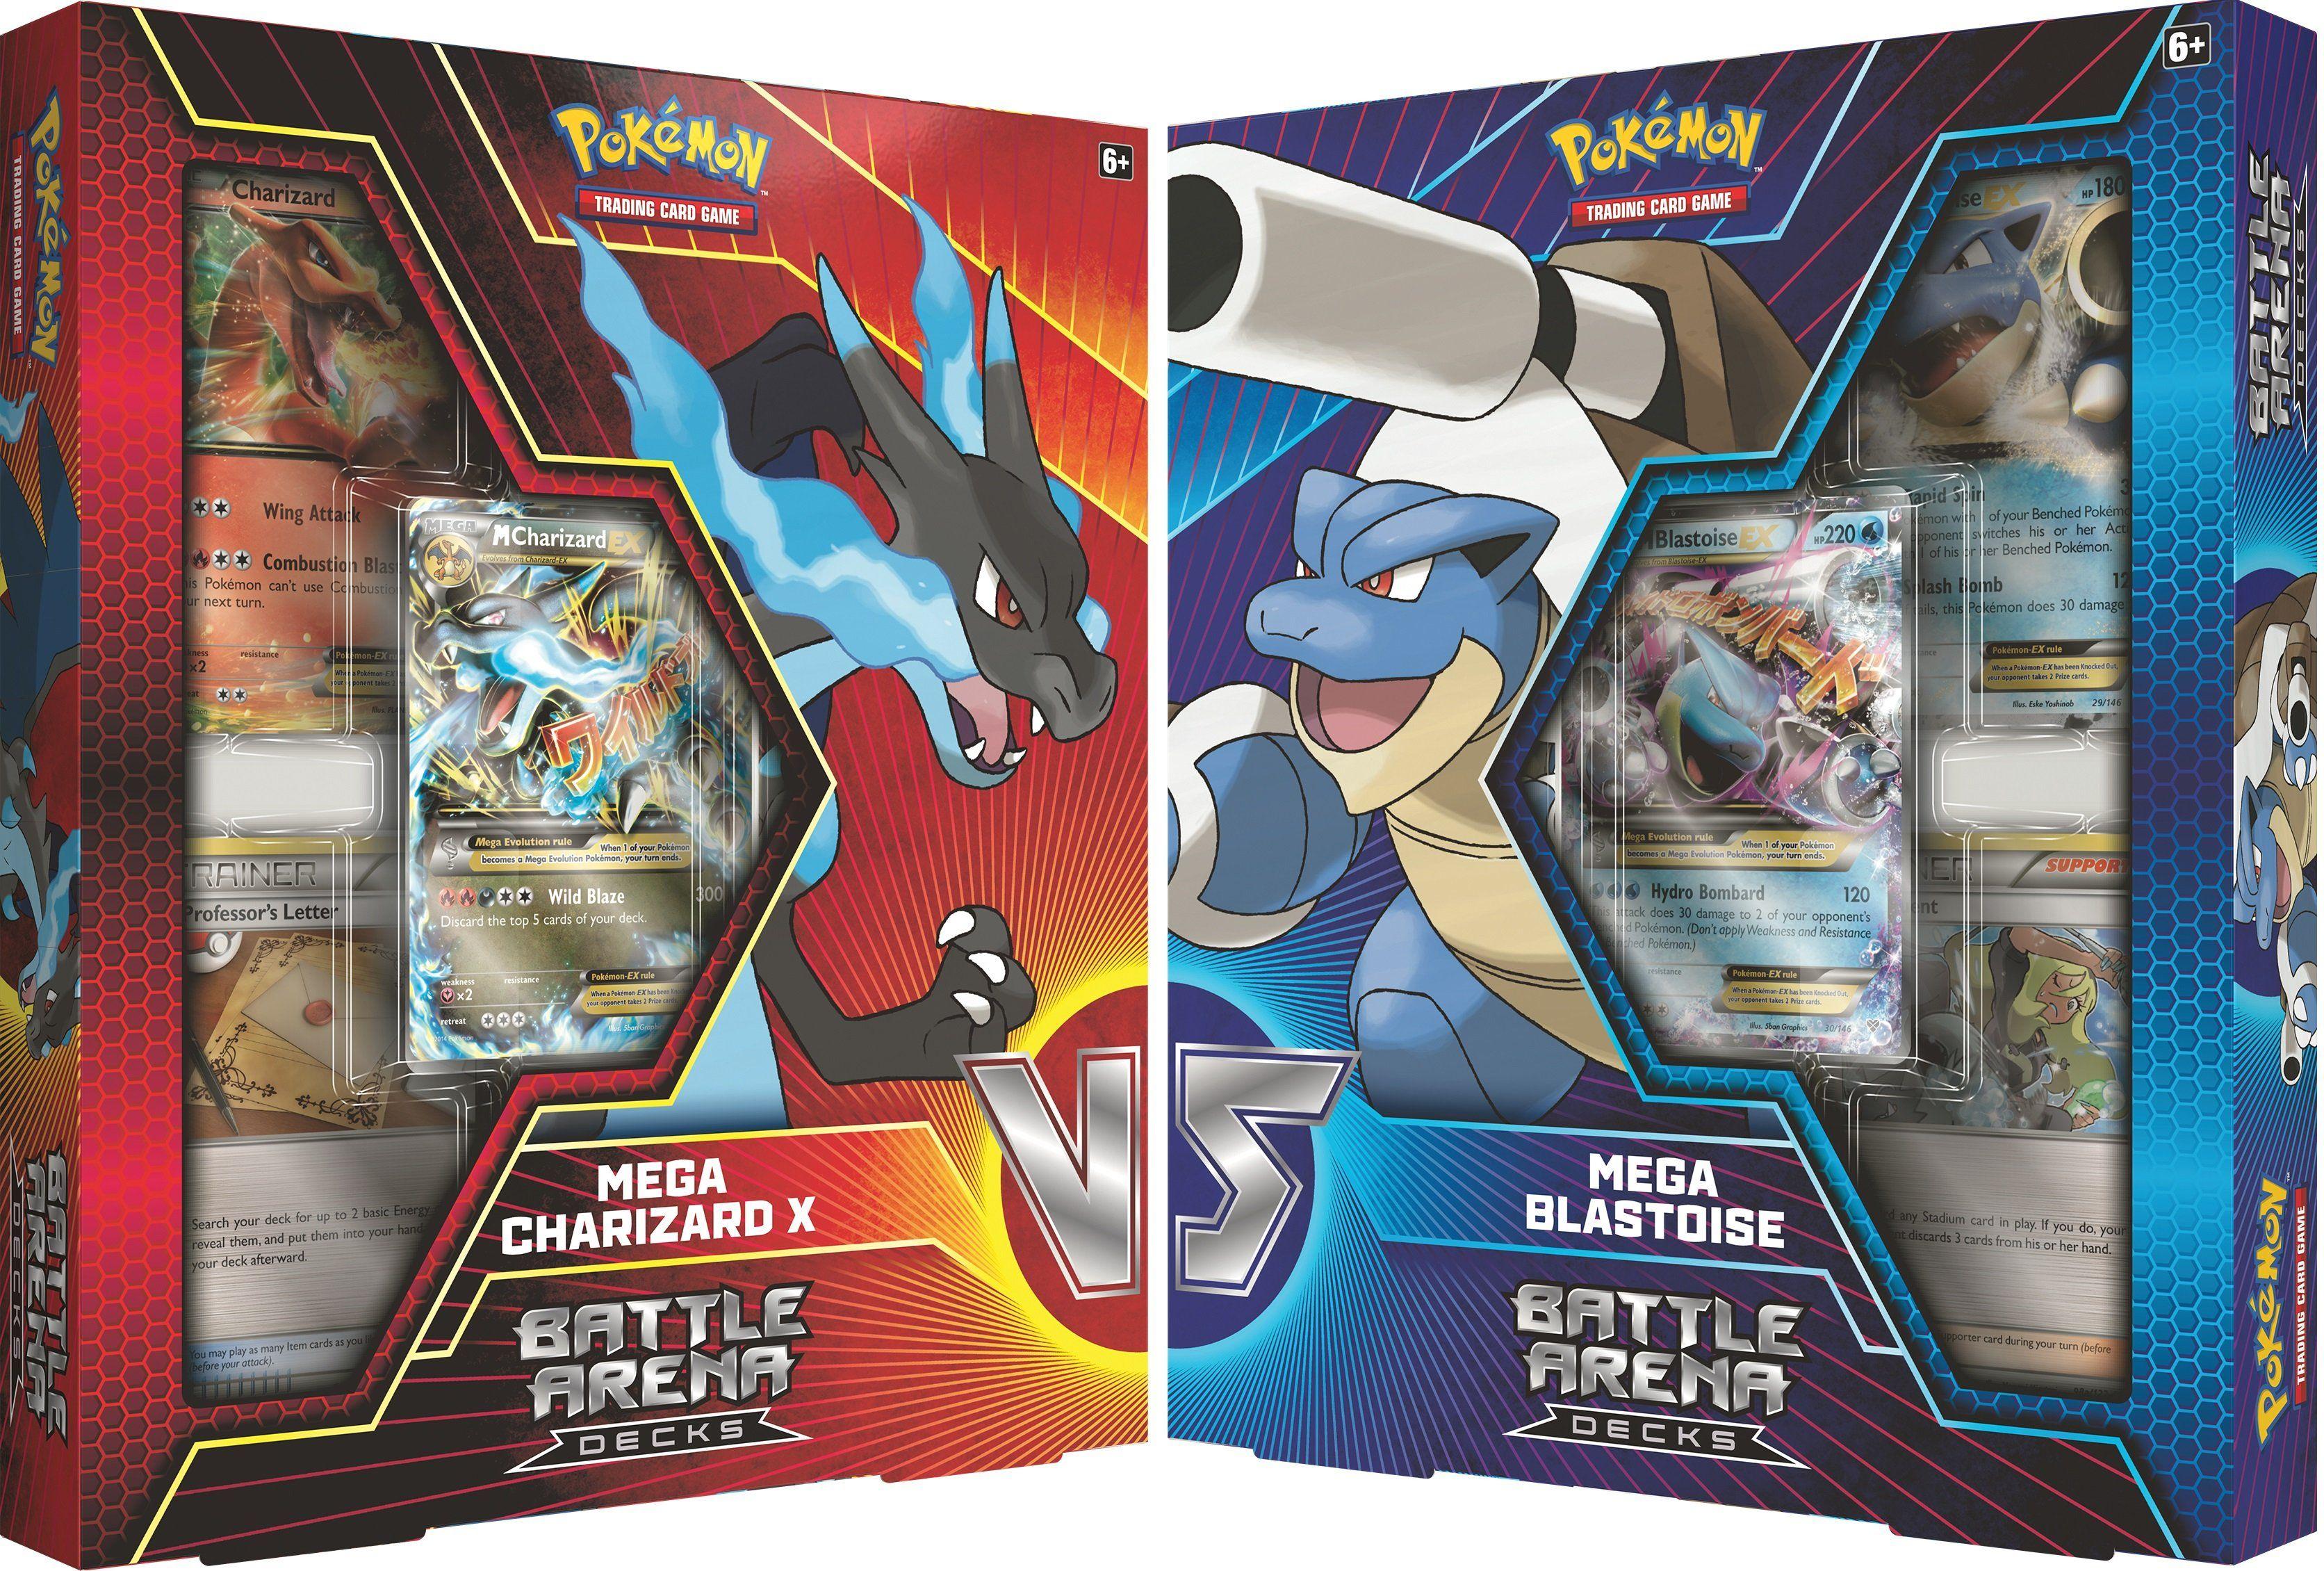 SET OF 2 Collector/'s Pin Sets Pokemon Cards Mega Blastoise /& Mega Venusaur